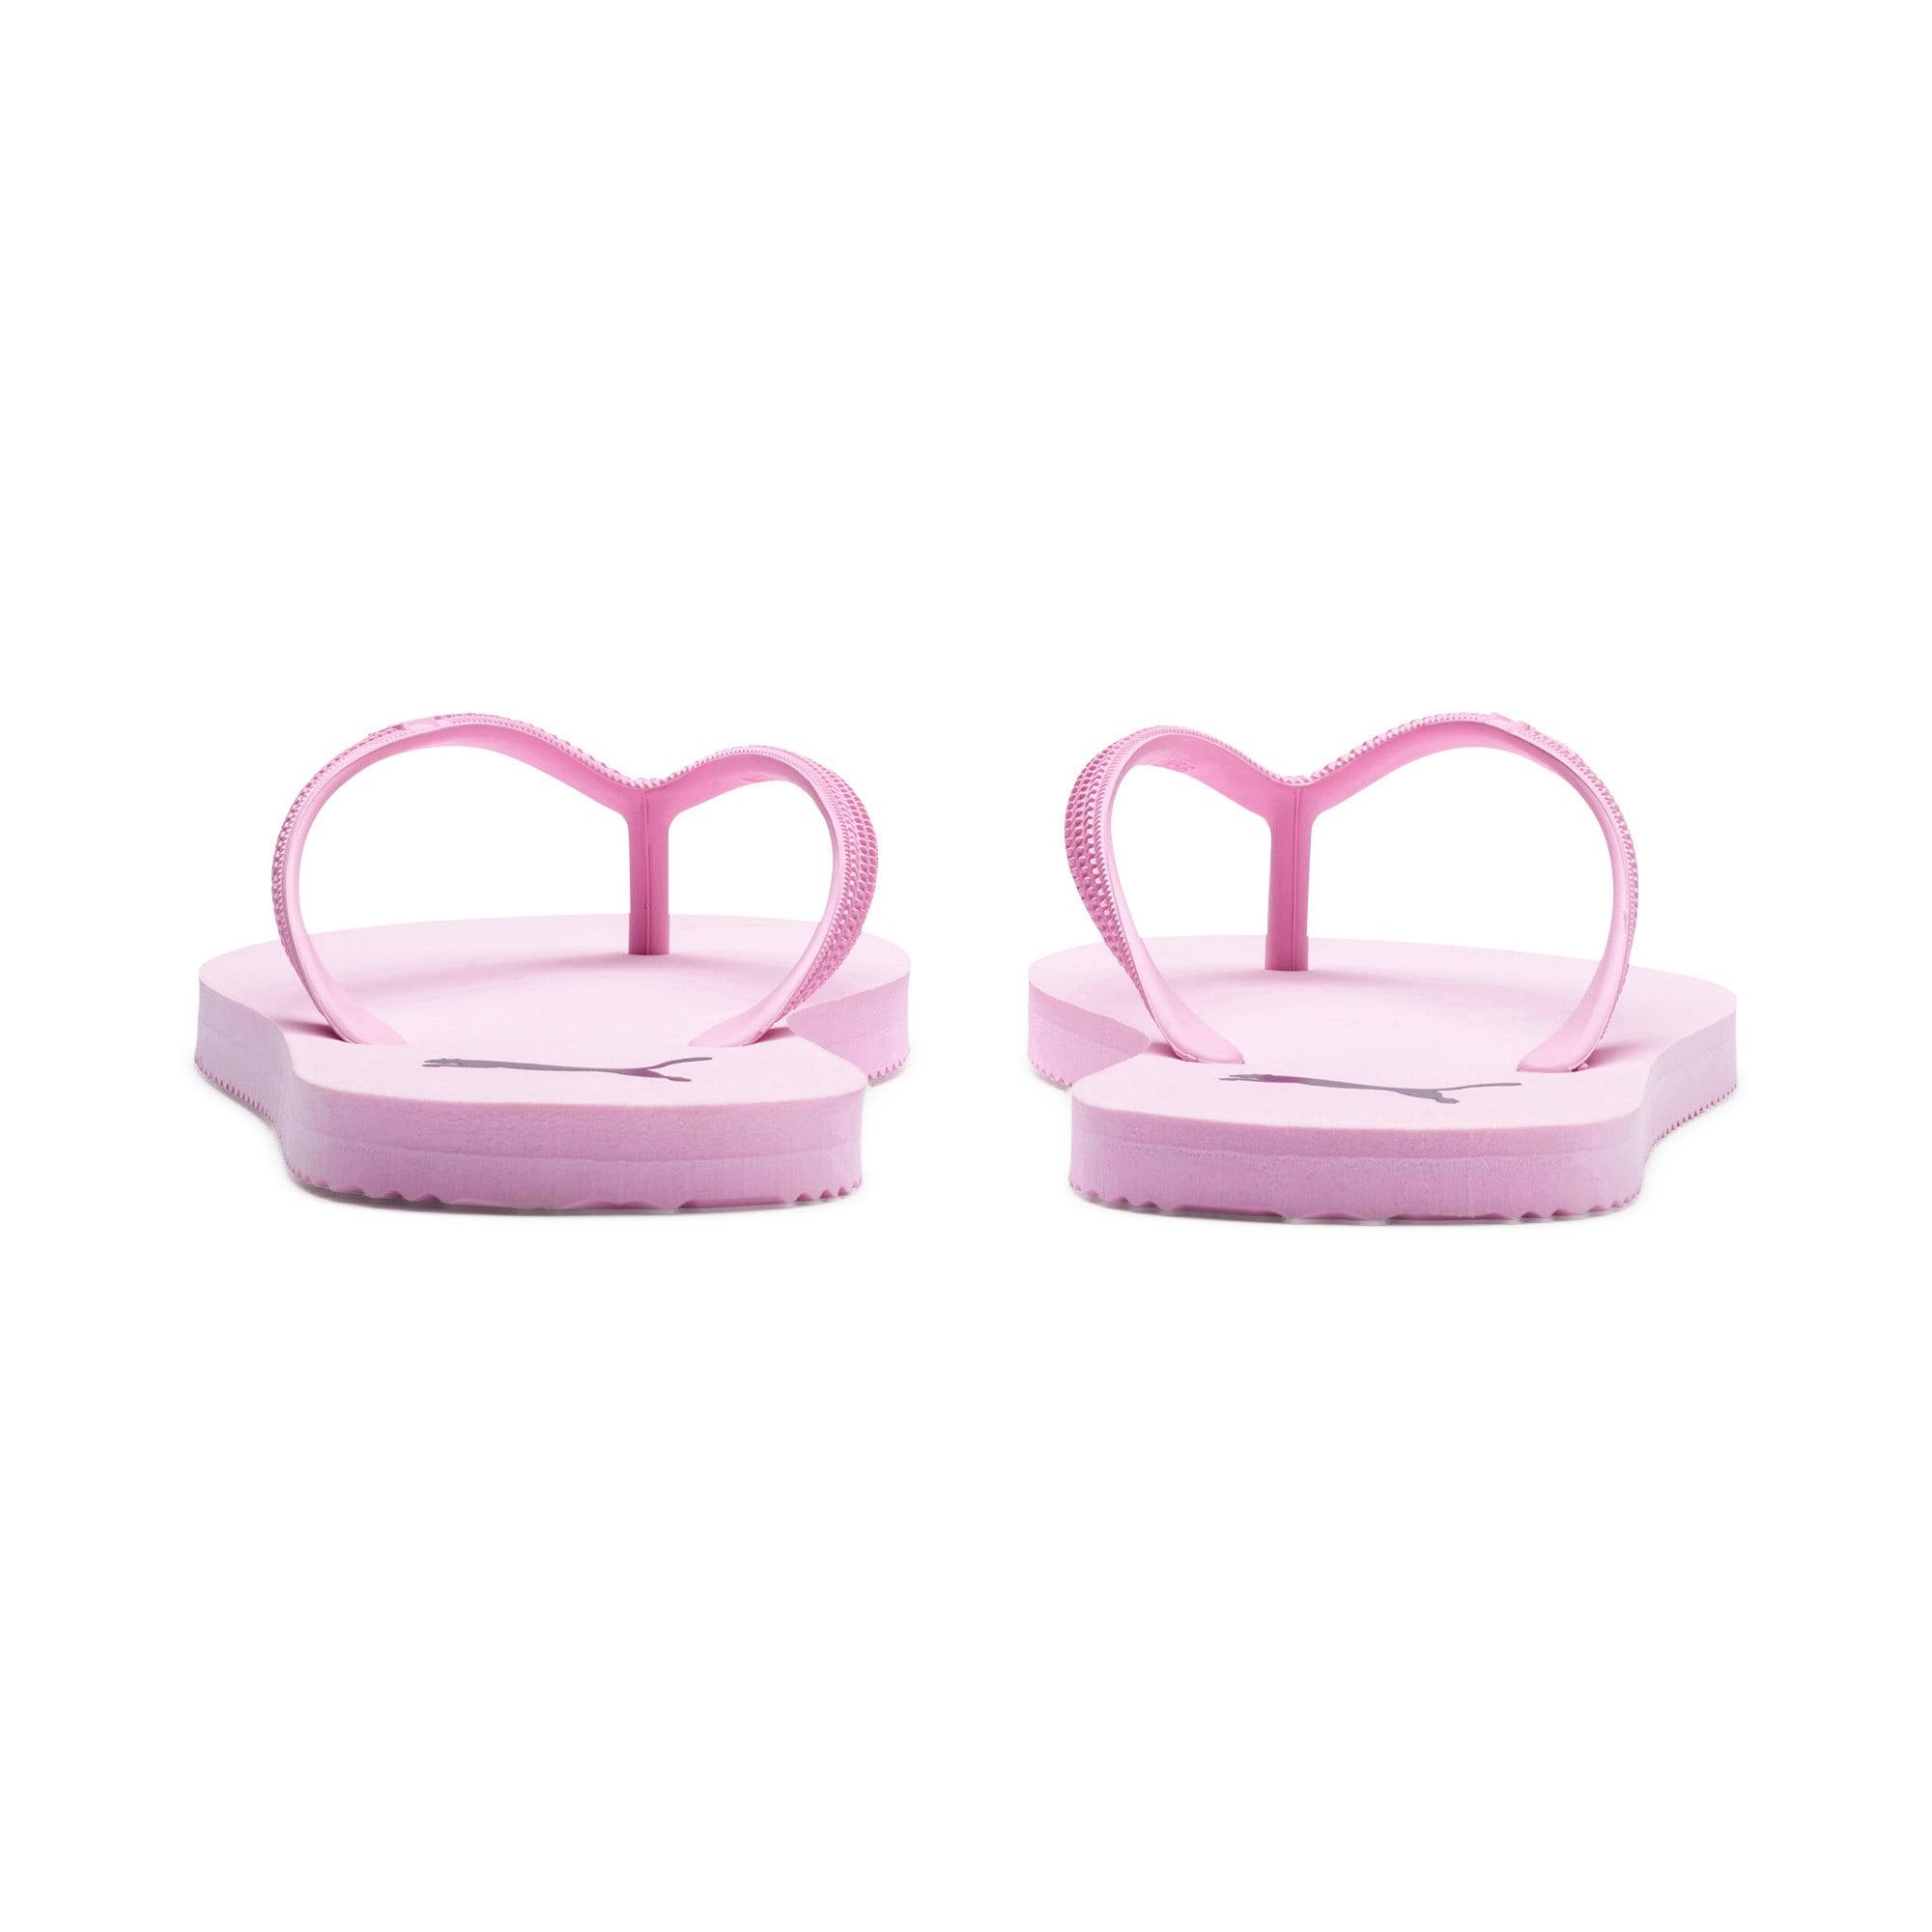 Thumbnail 3 of First Flip Women's Sandals, Pale Pink-Indigo, medium